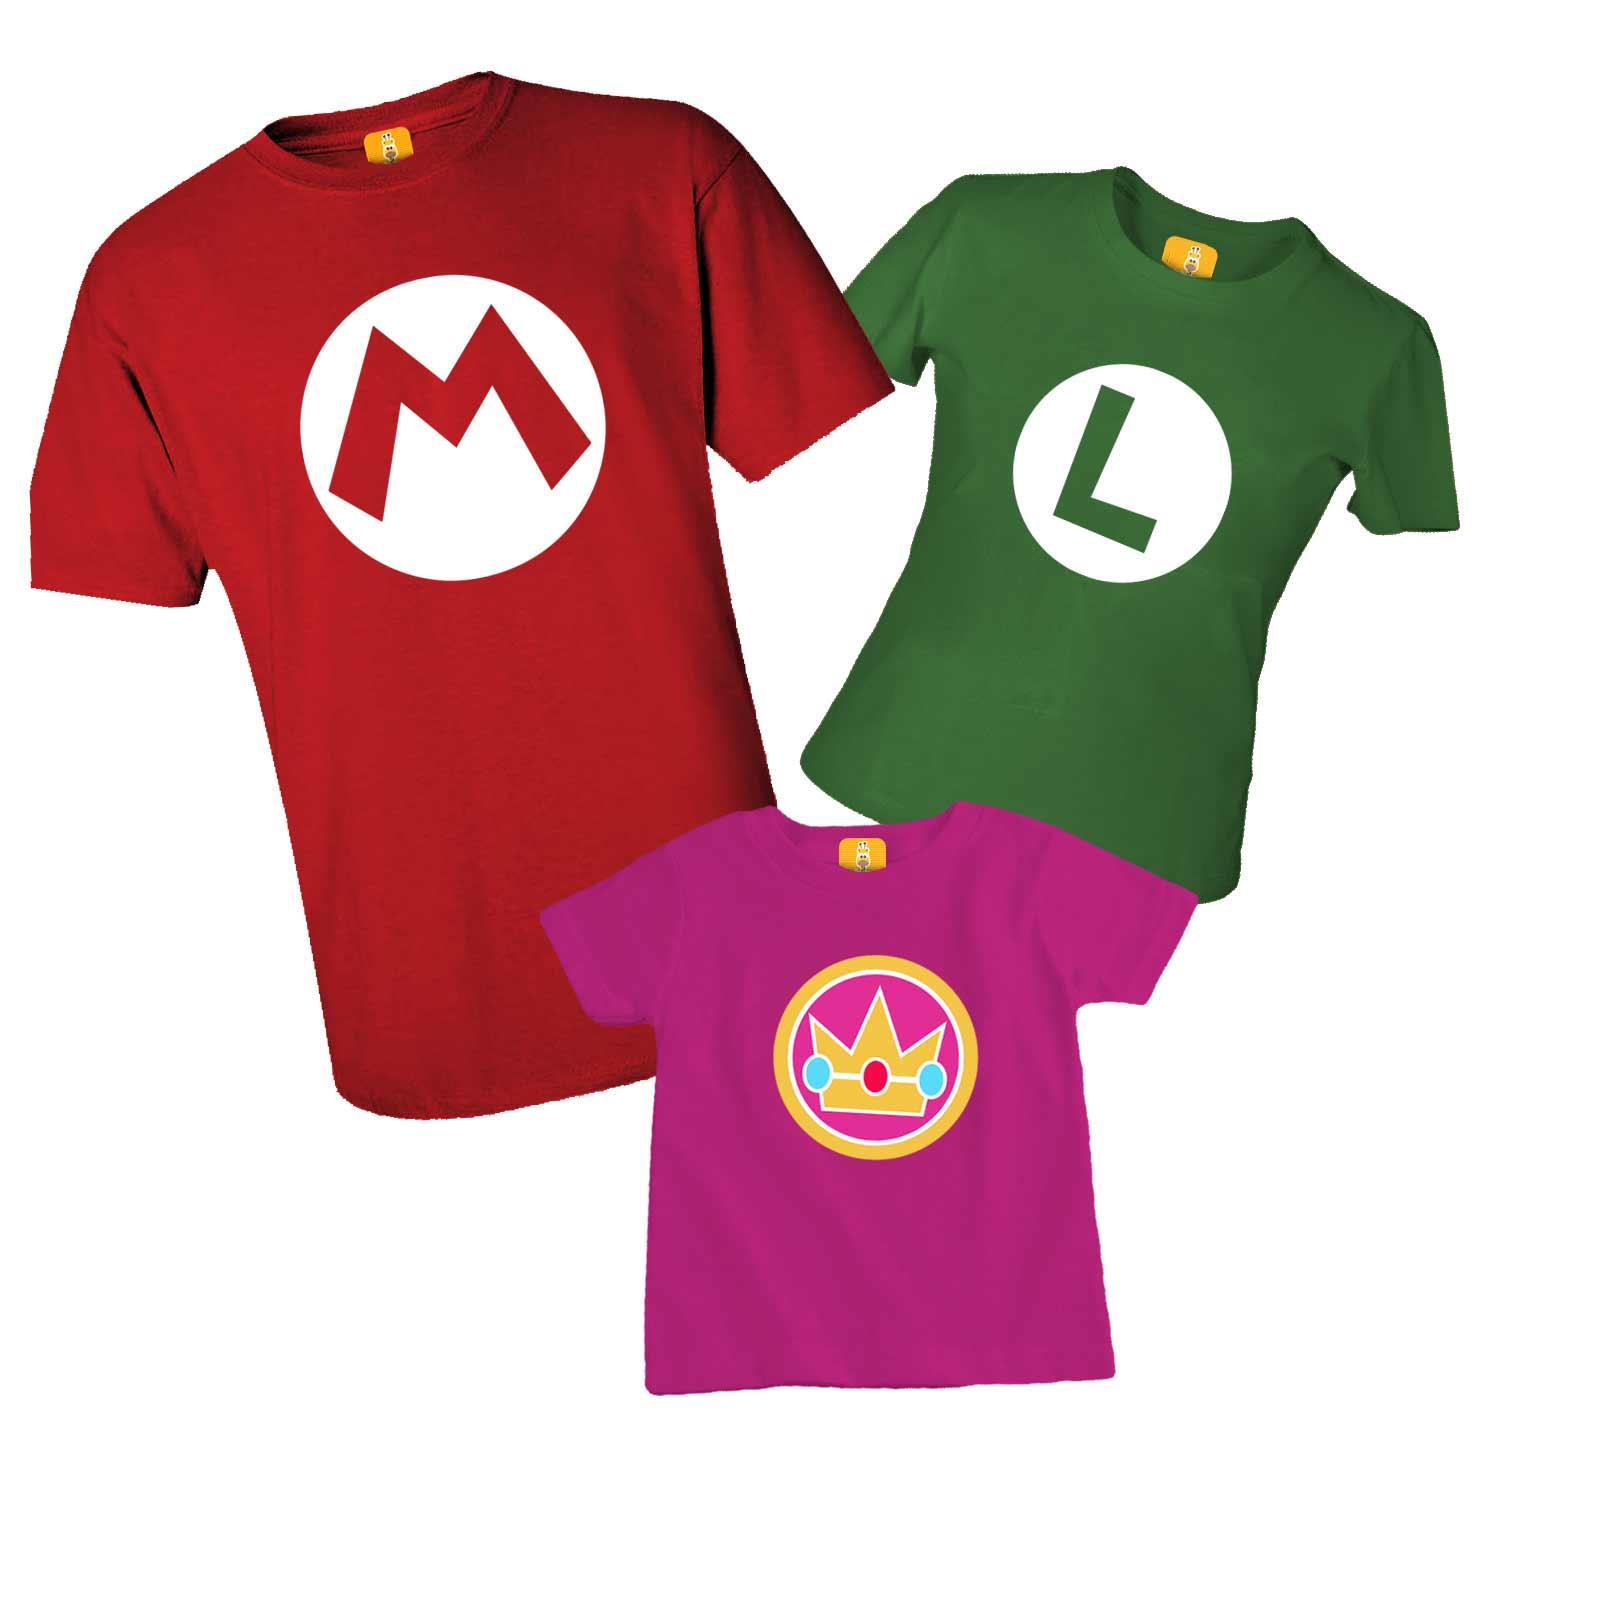 Kit camiseta aniversário - Super mario, Luigi e princesa Peach